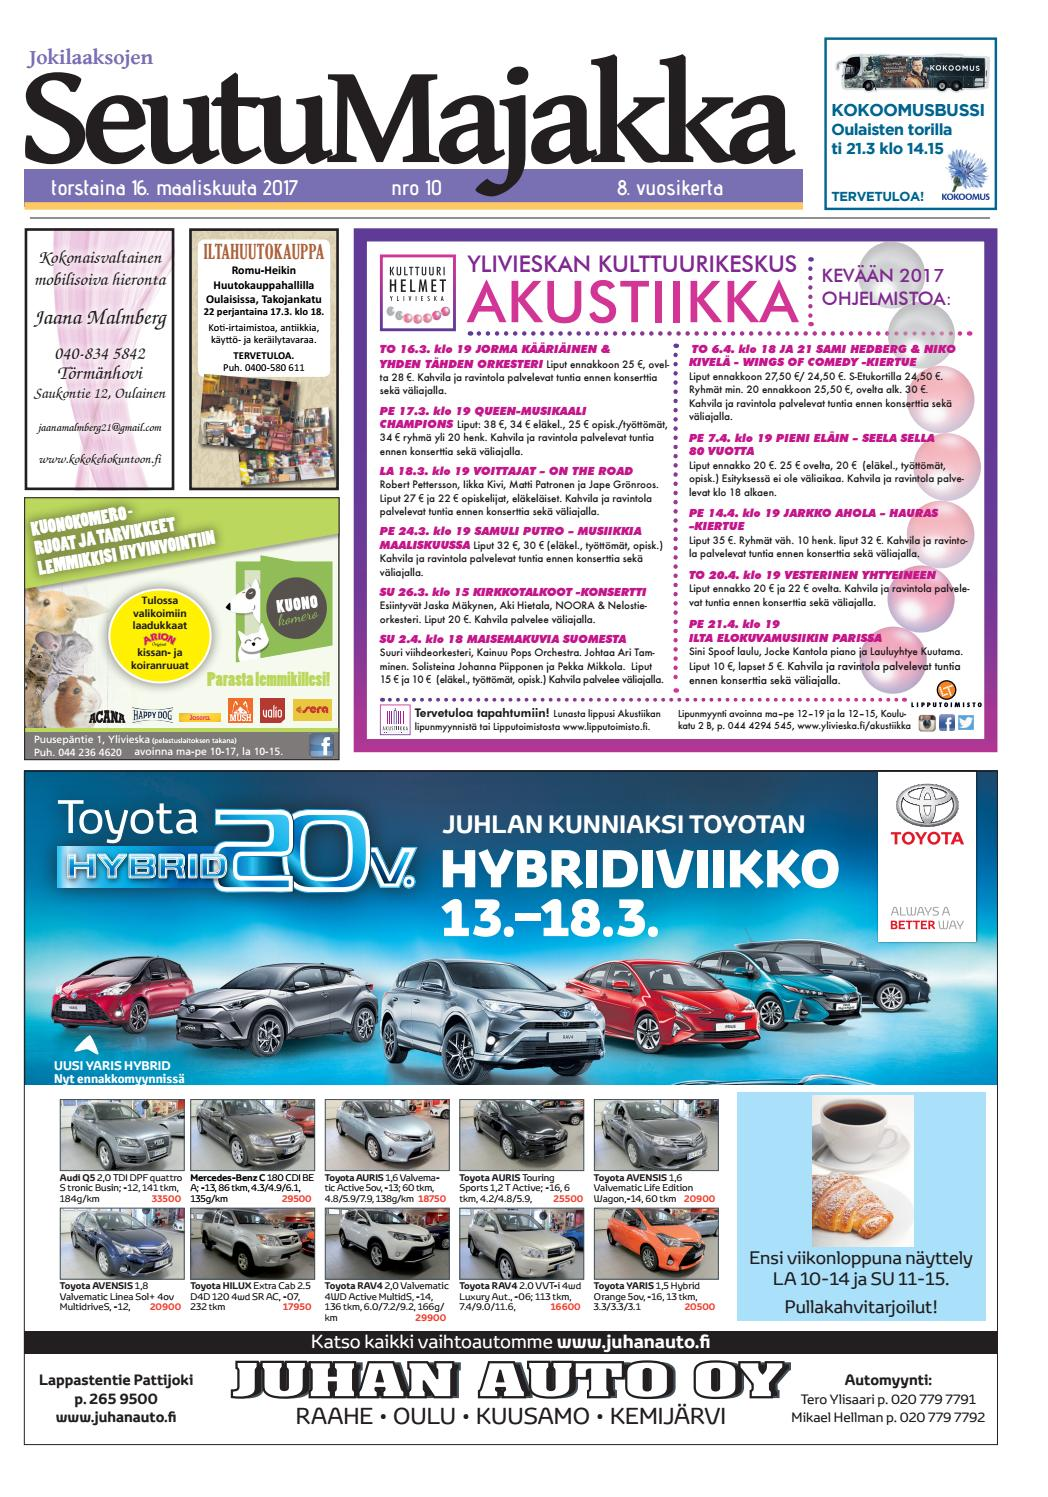 seksi lelu suomi24 posti fi